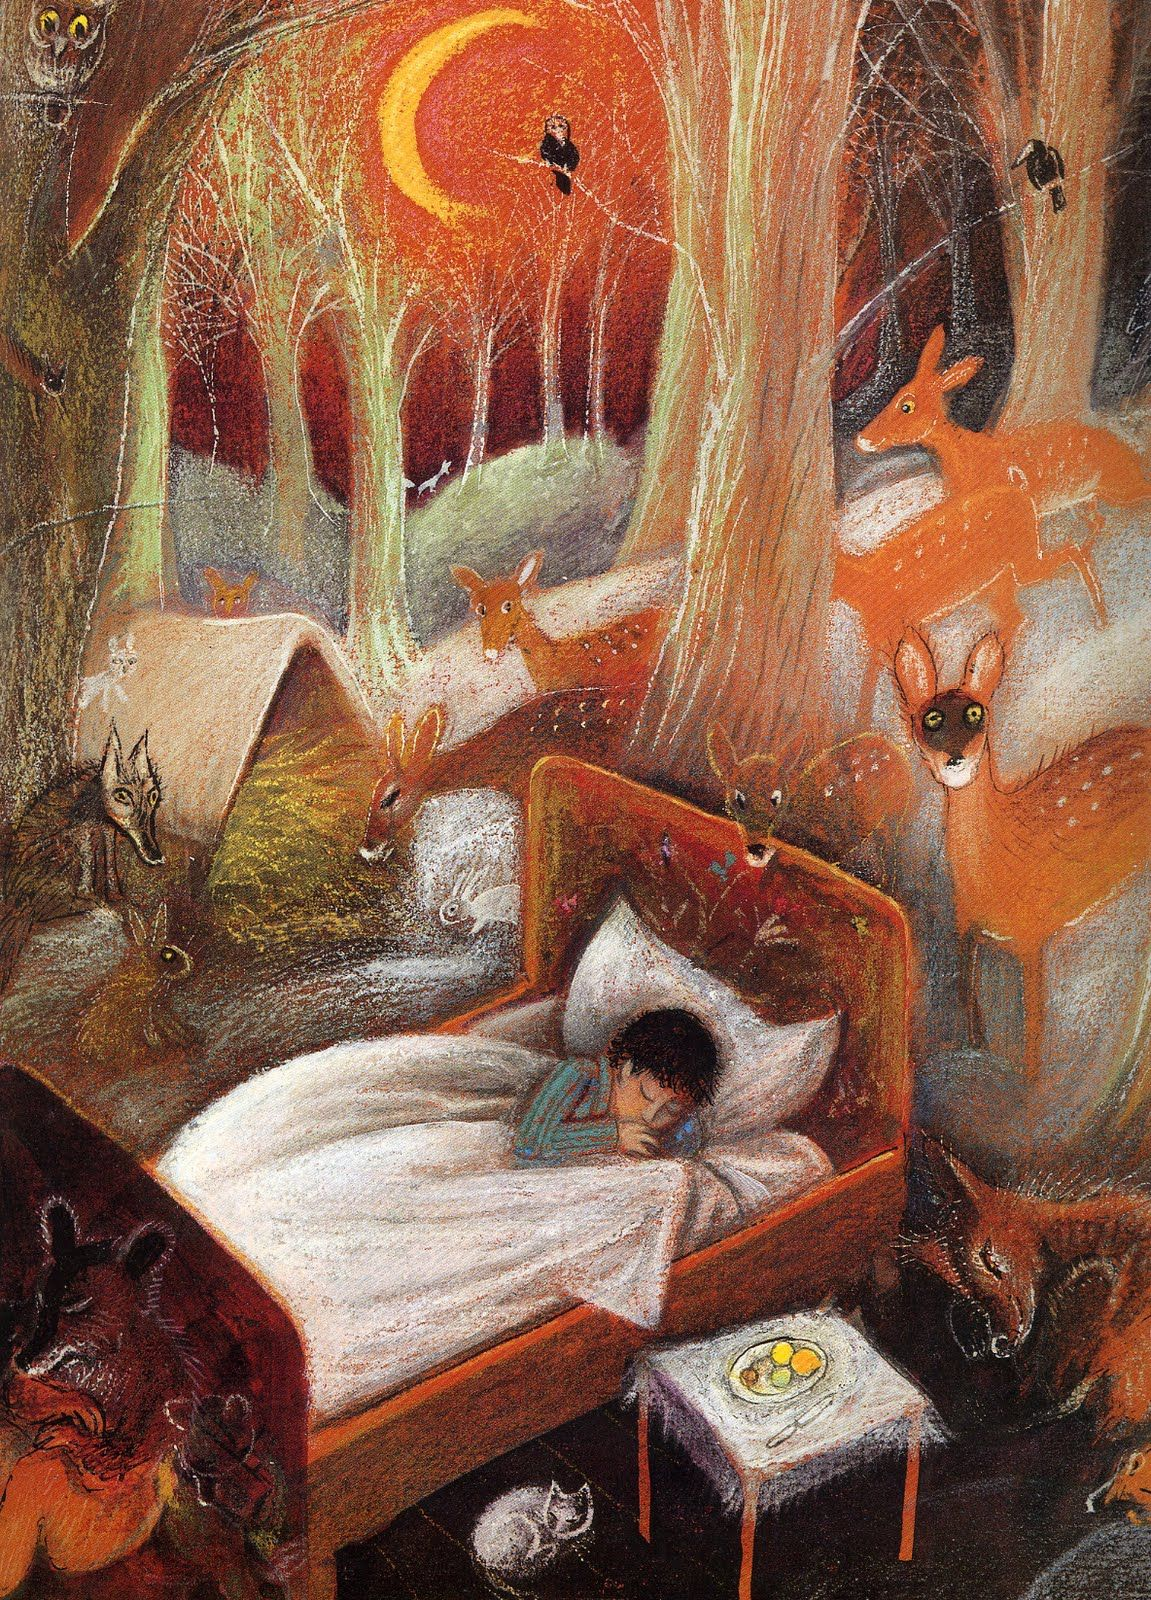 Sweet Illustrated Storytime Illustration Zef